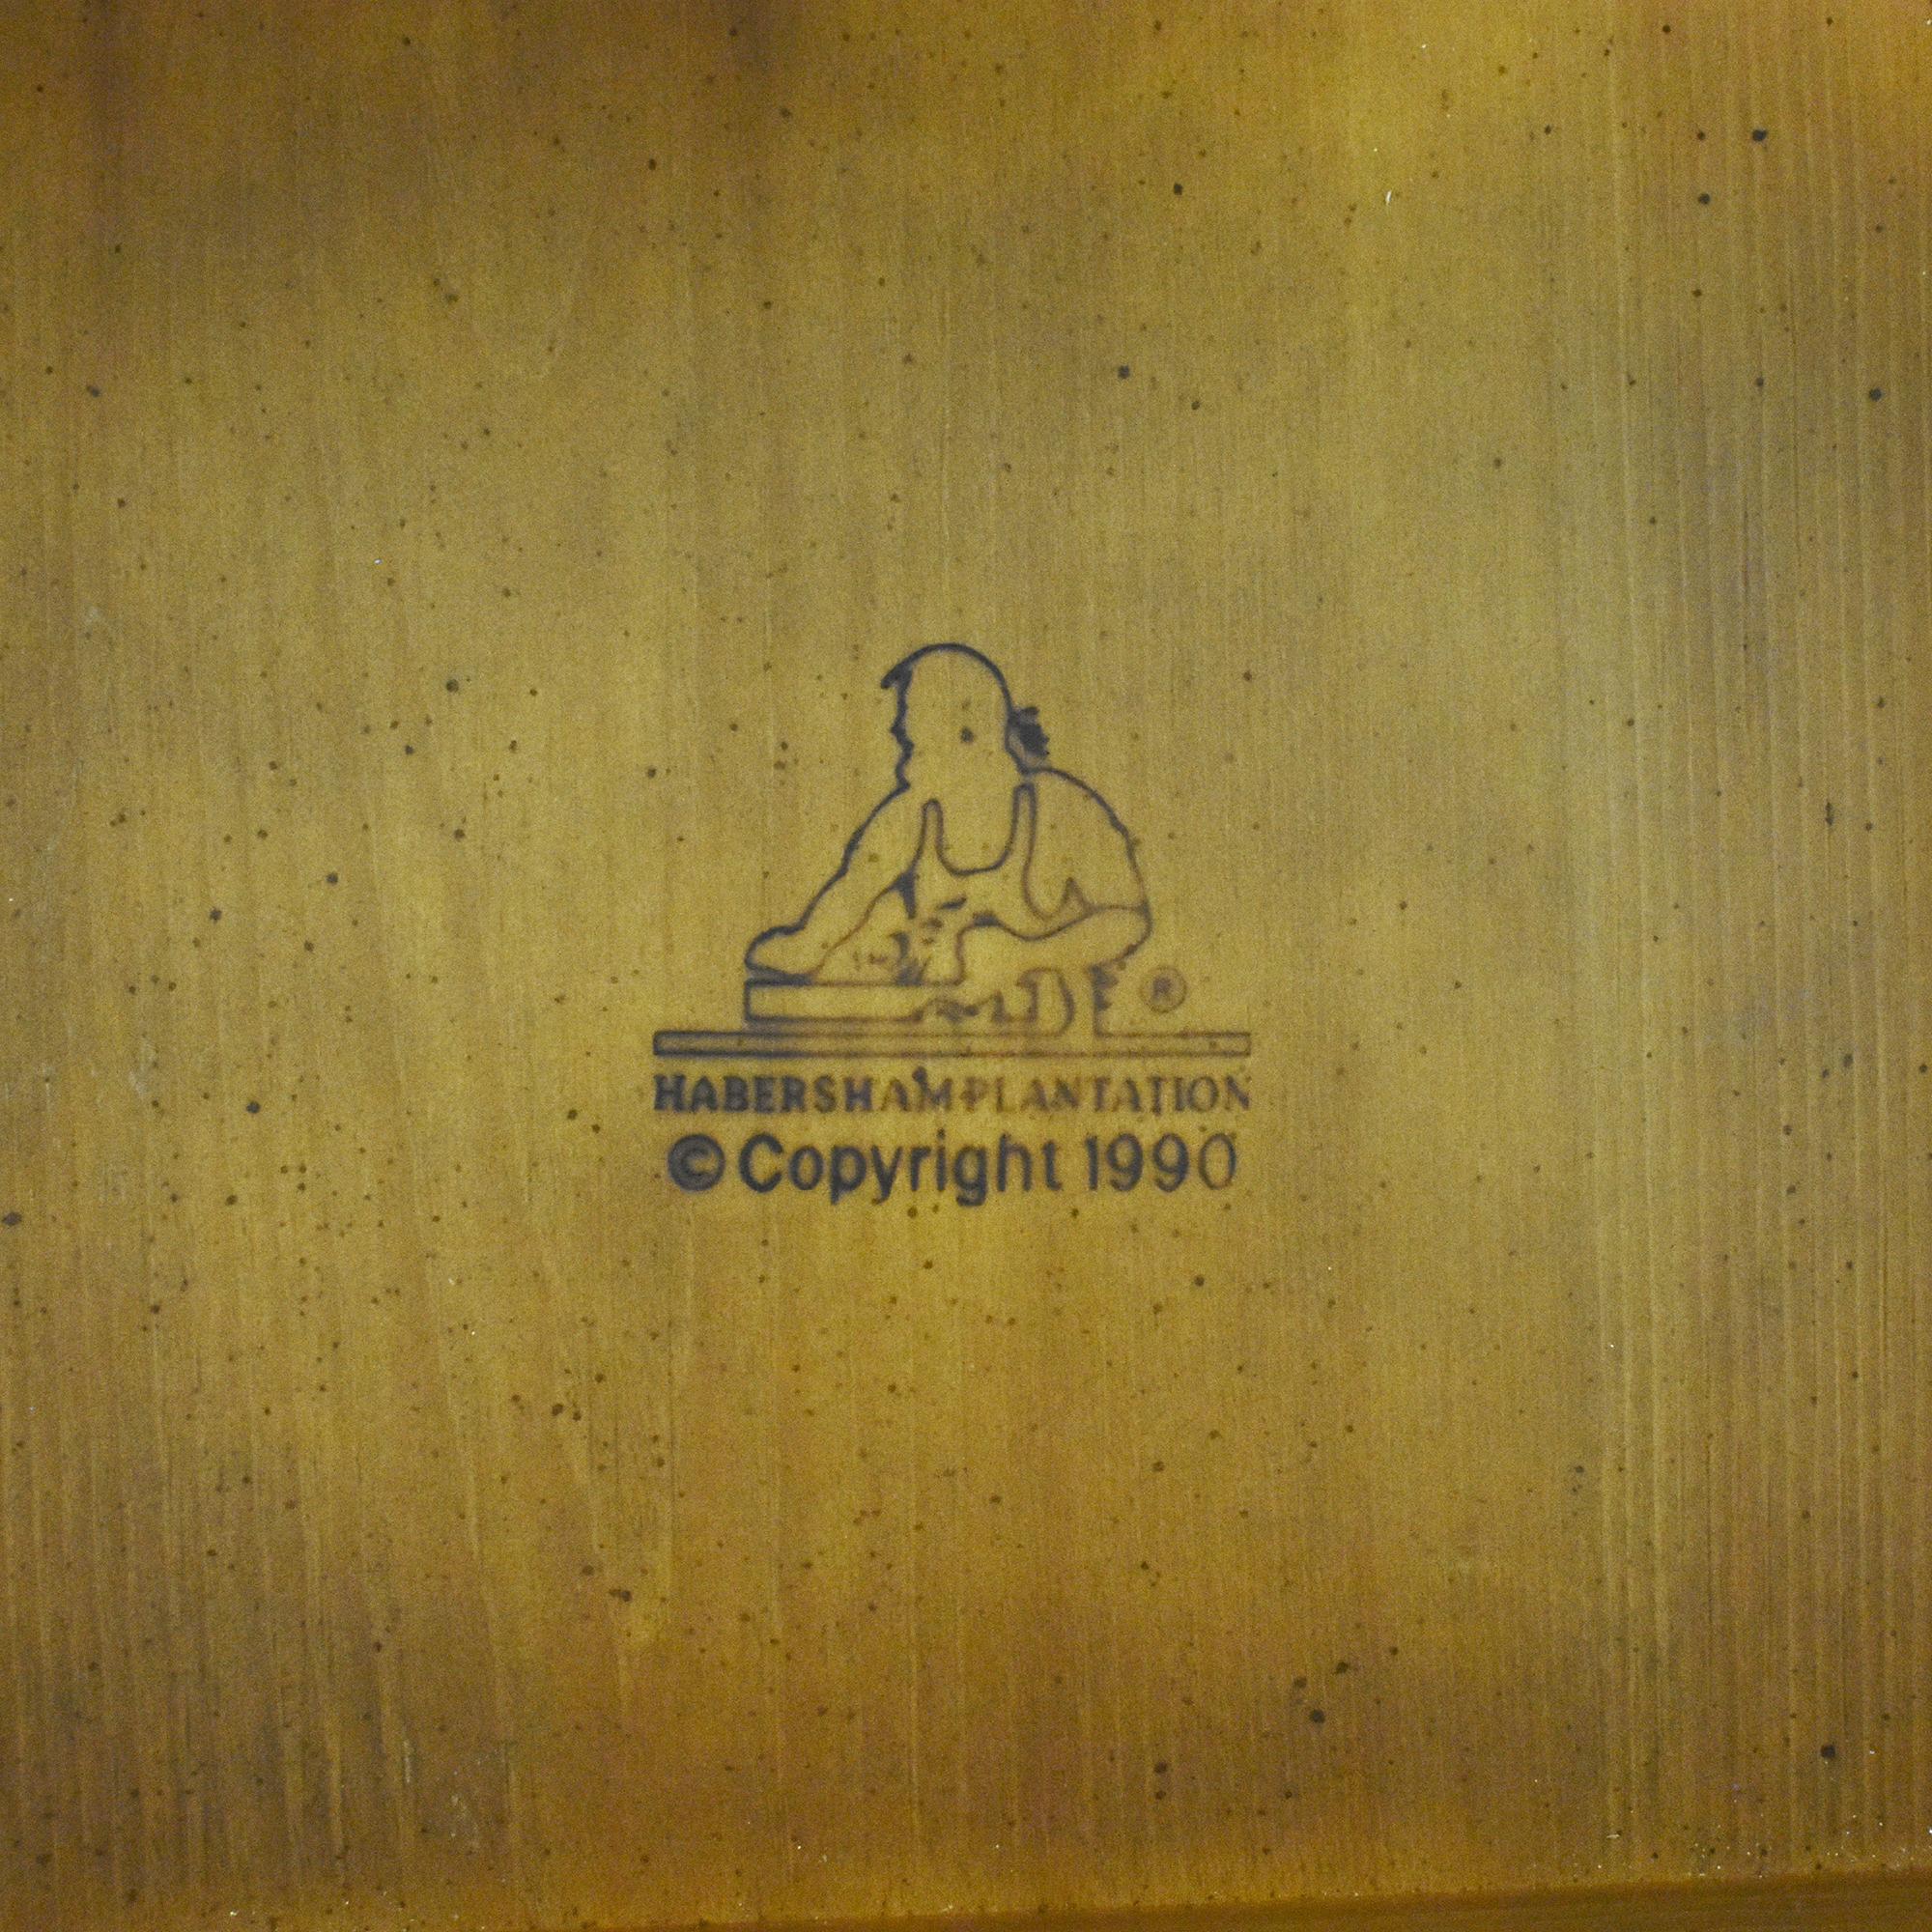 shop Habersham Console Table with Two Drawers Habersham